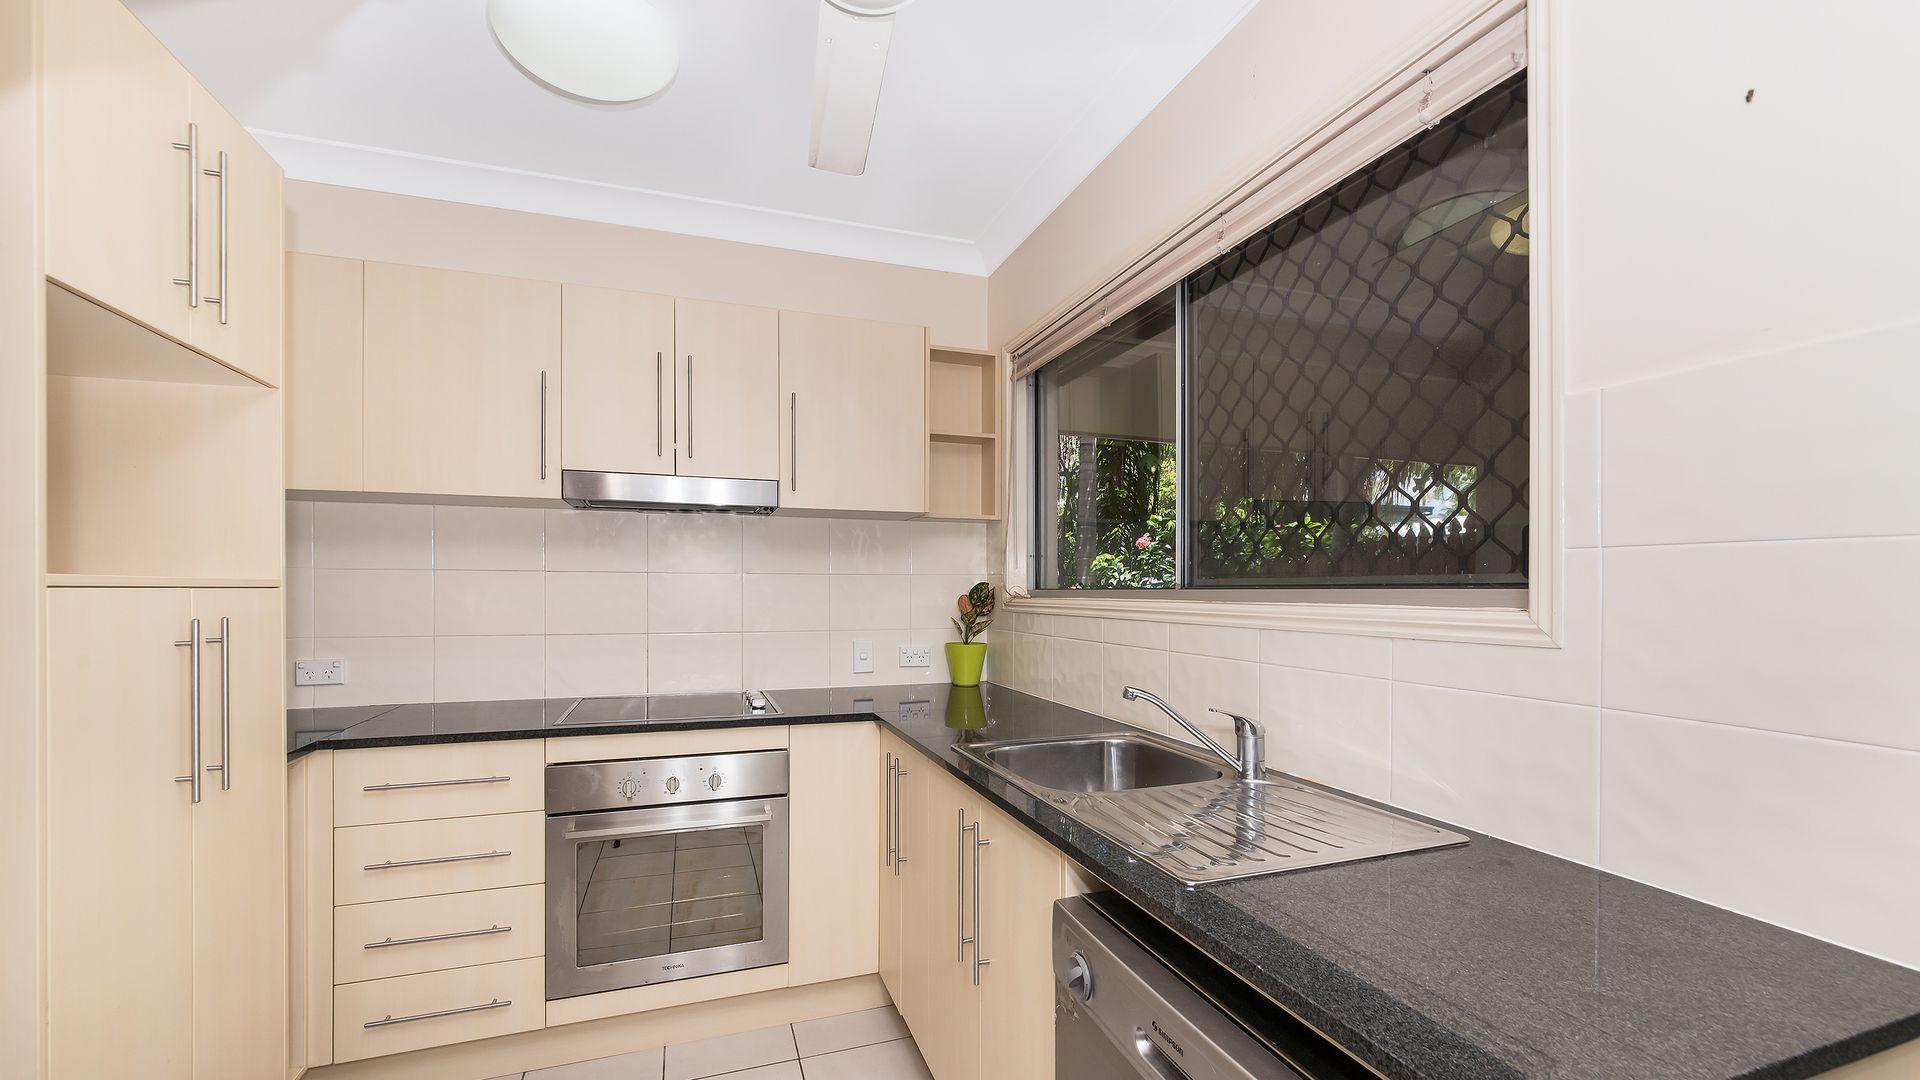 3/37 Latchford Street, Pimlico QLD 4812, Image 1